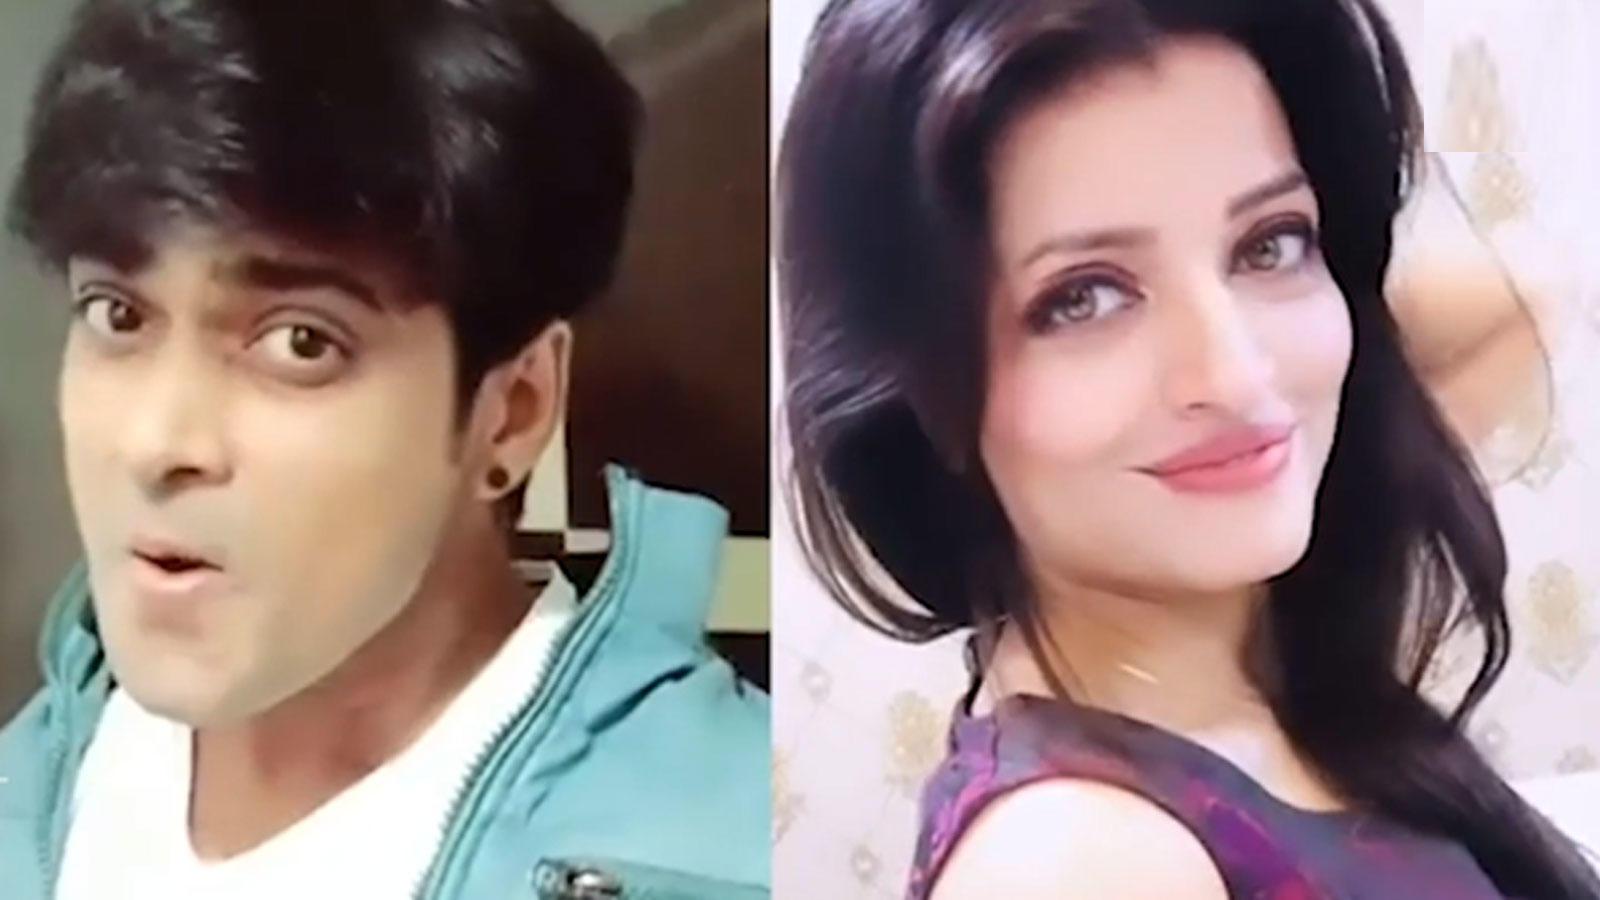 salman-khan-and-aishwarya-rai-bachchans-lookalikes-win-praises-as-they-lip-synch-together